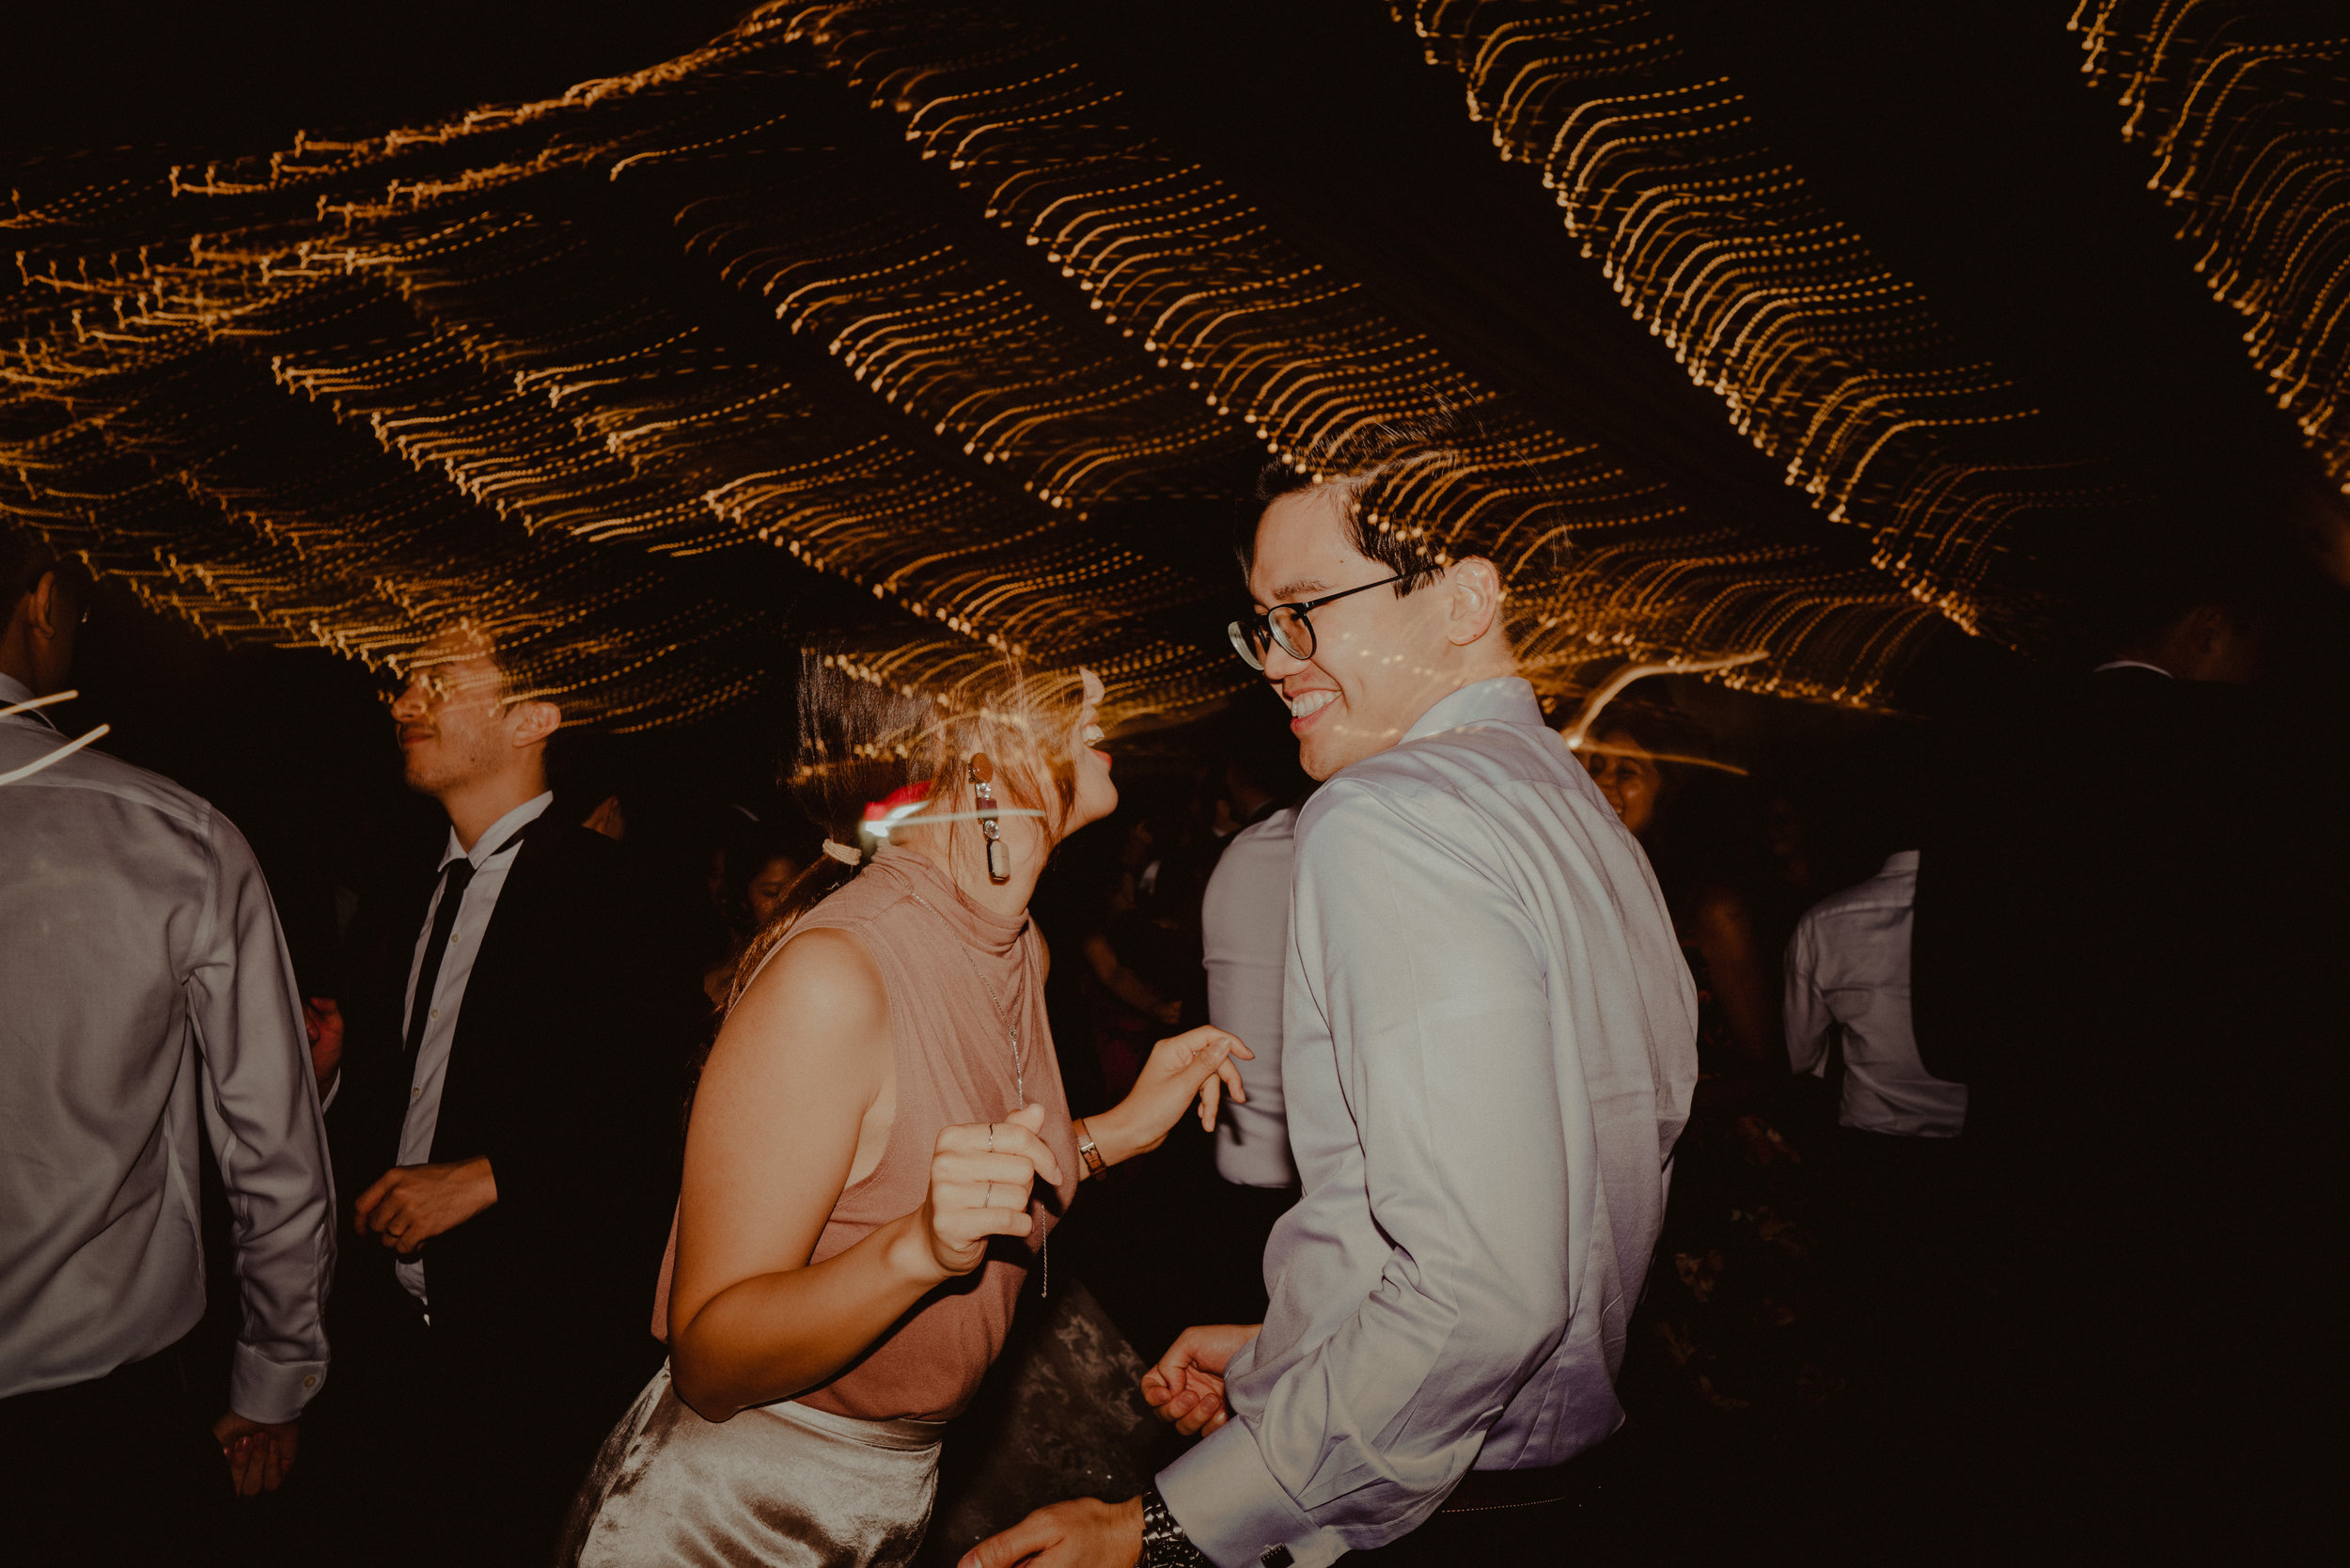 Irene-and-Jae-2019_Brooklyn_Wedding_Photographer_Chellise_Michael_Photography--160.jpg